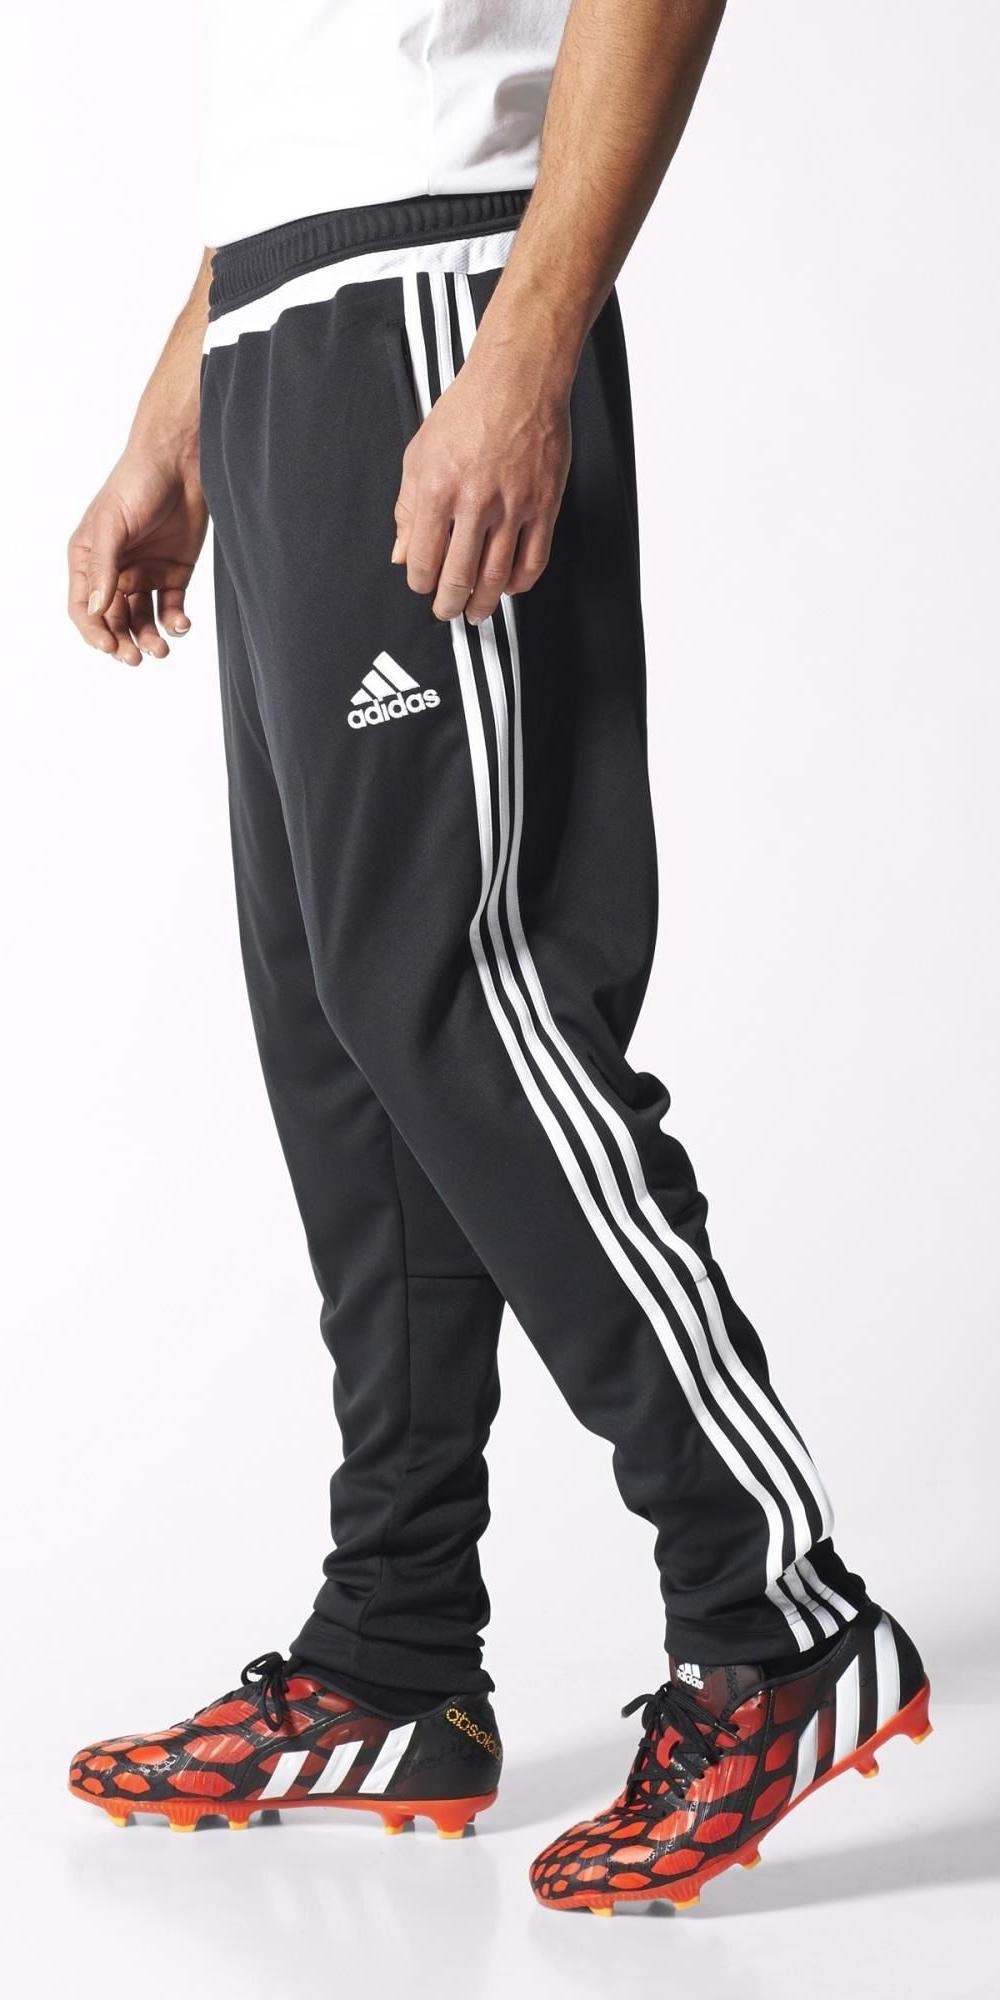 tiro 15 adidas track pantalon pants hose blanc noir cheville proximit homme ebay. Black Bedroom Furniture Sets. Home Design Ideas